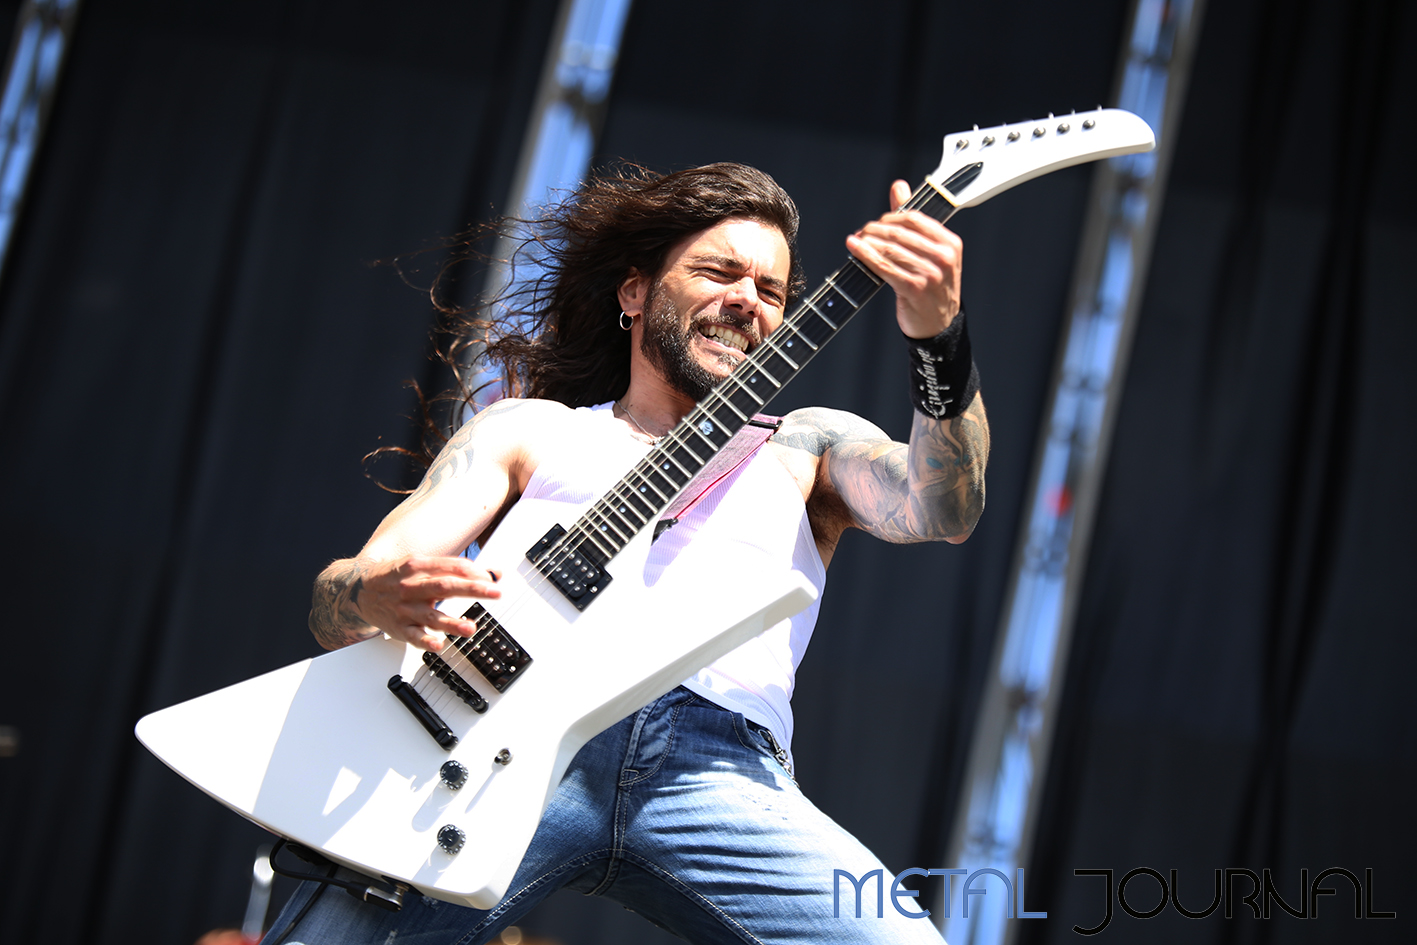 leo jiménez metal journal rock the coast 2019 pic 5